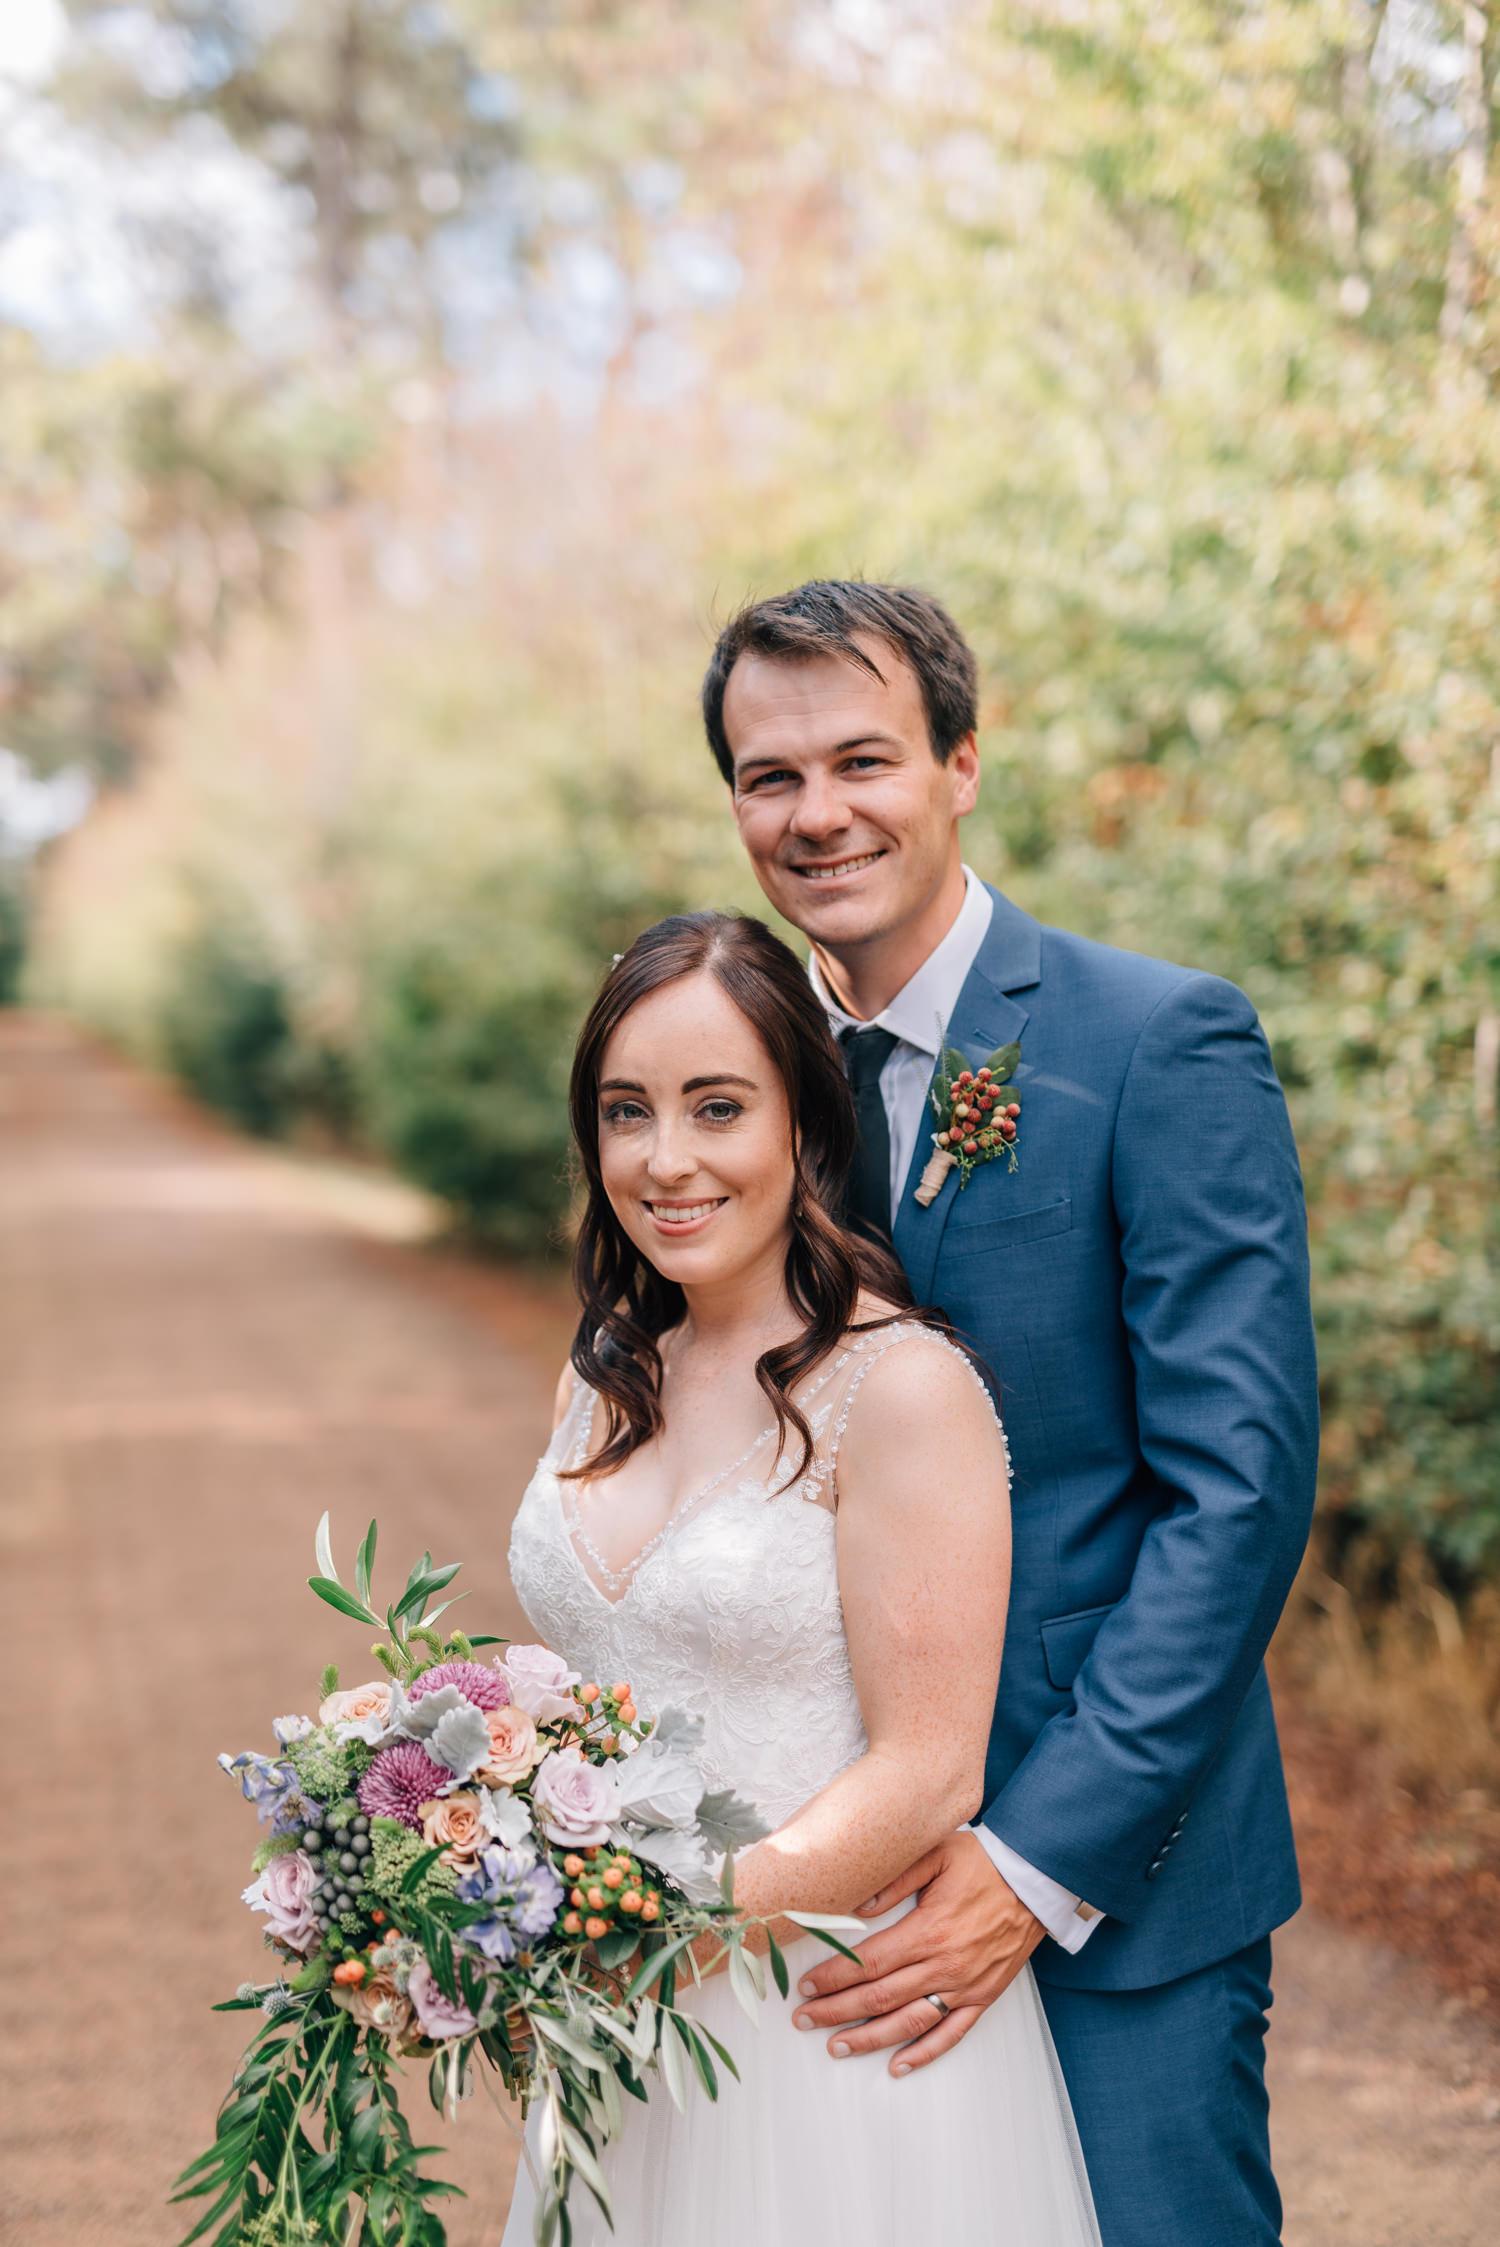 Quamby-Wedding-Photographer-108.jpg